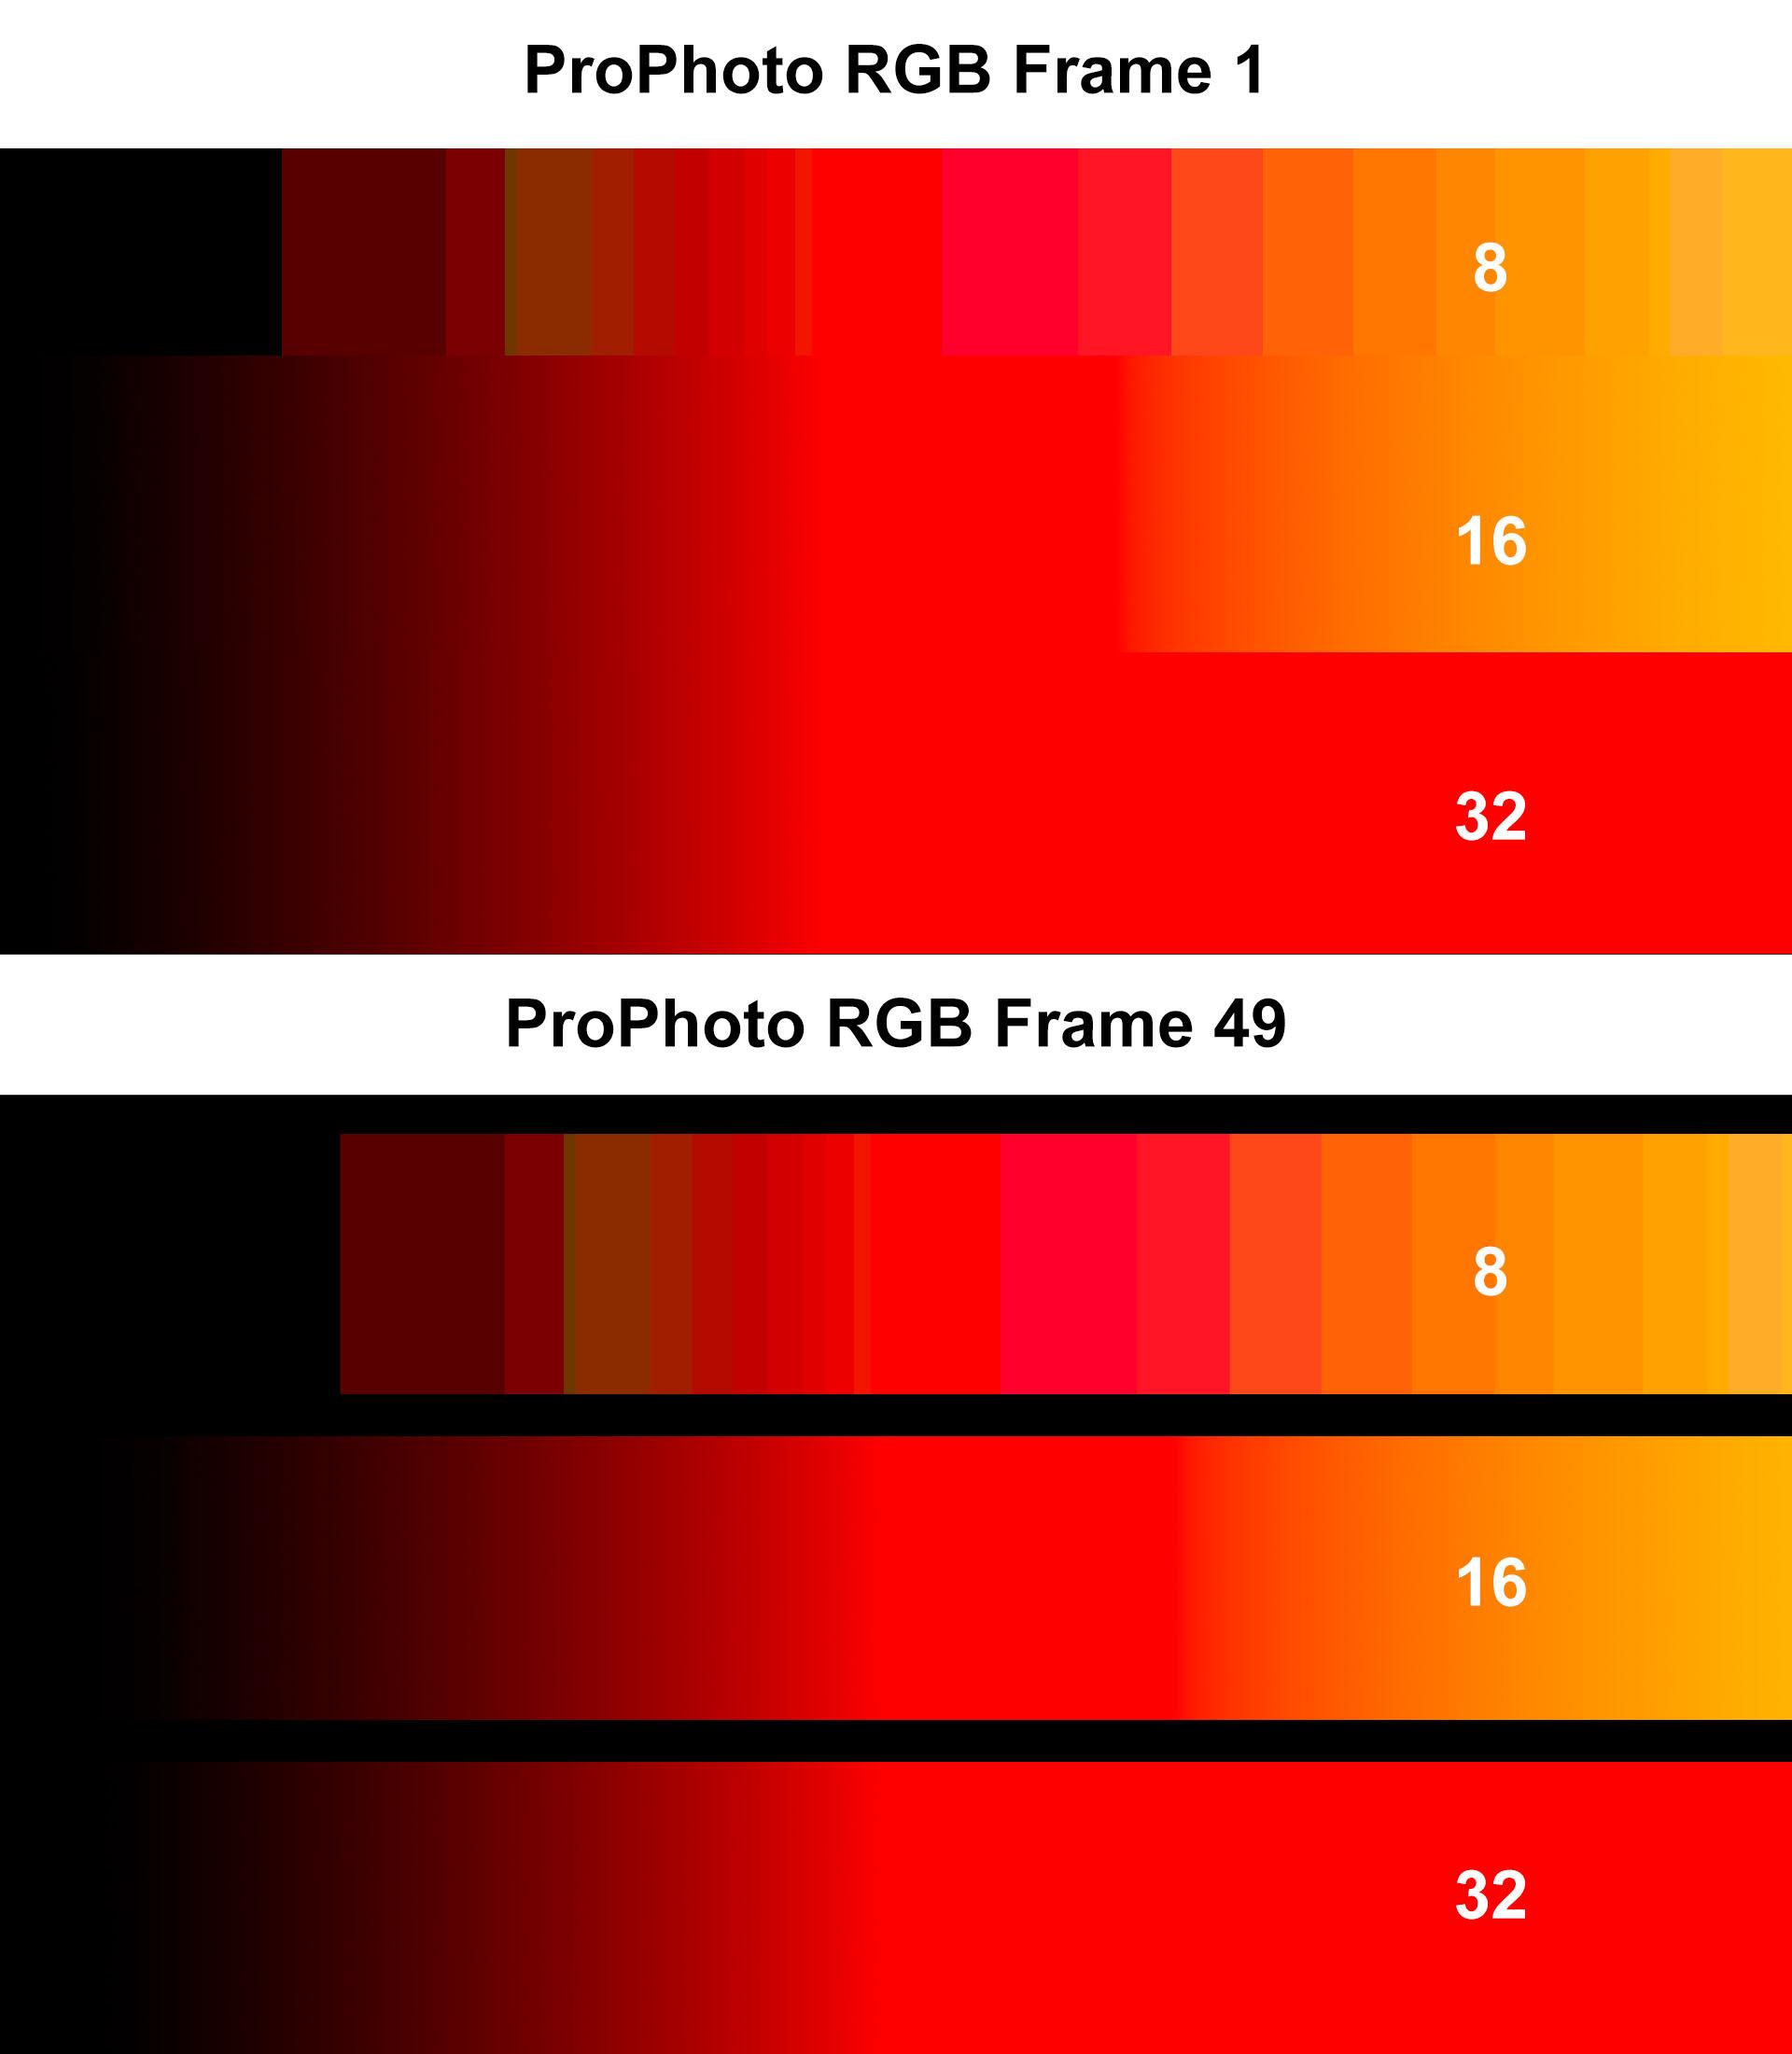 PP RGB Comparison